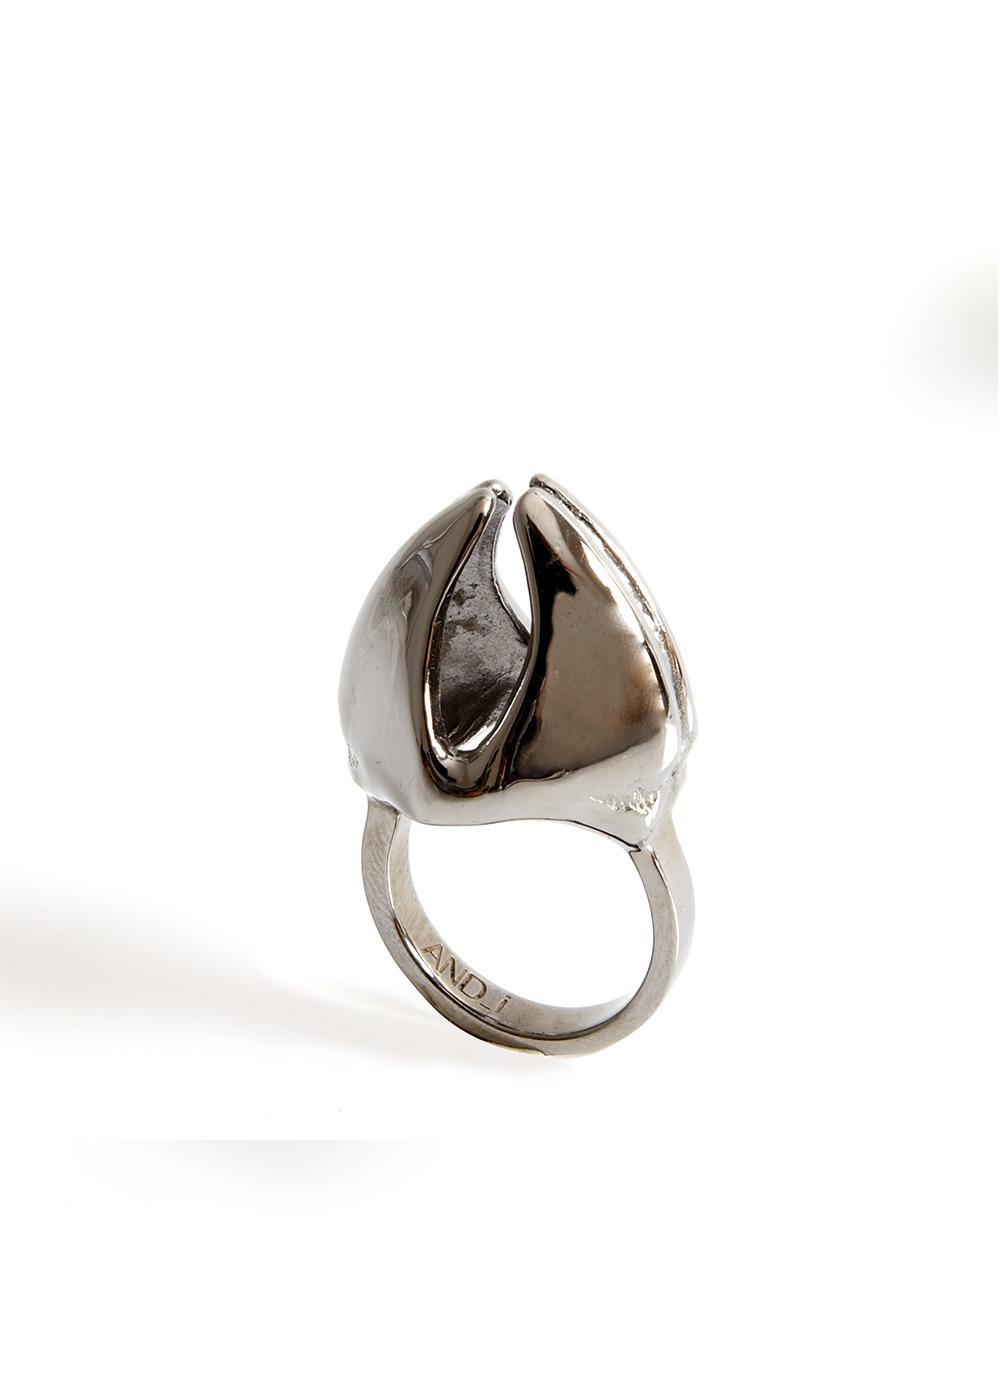 mandibile ring3, black rhodanized